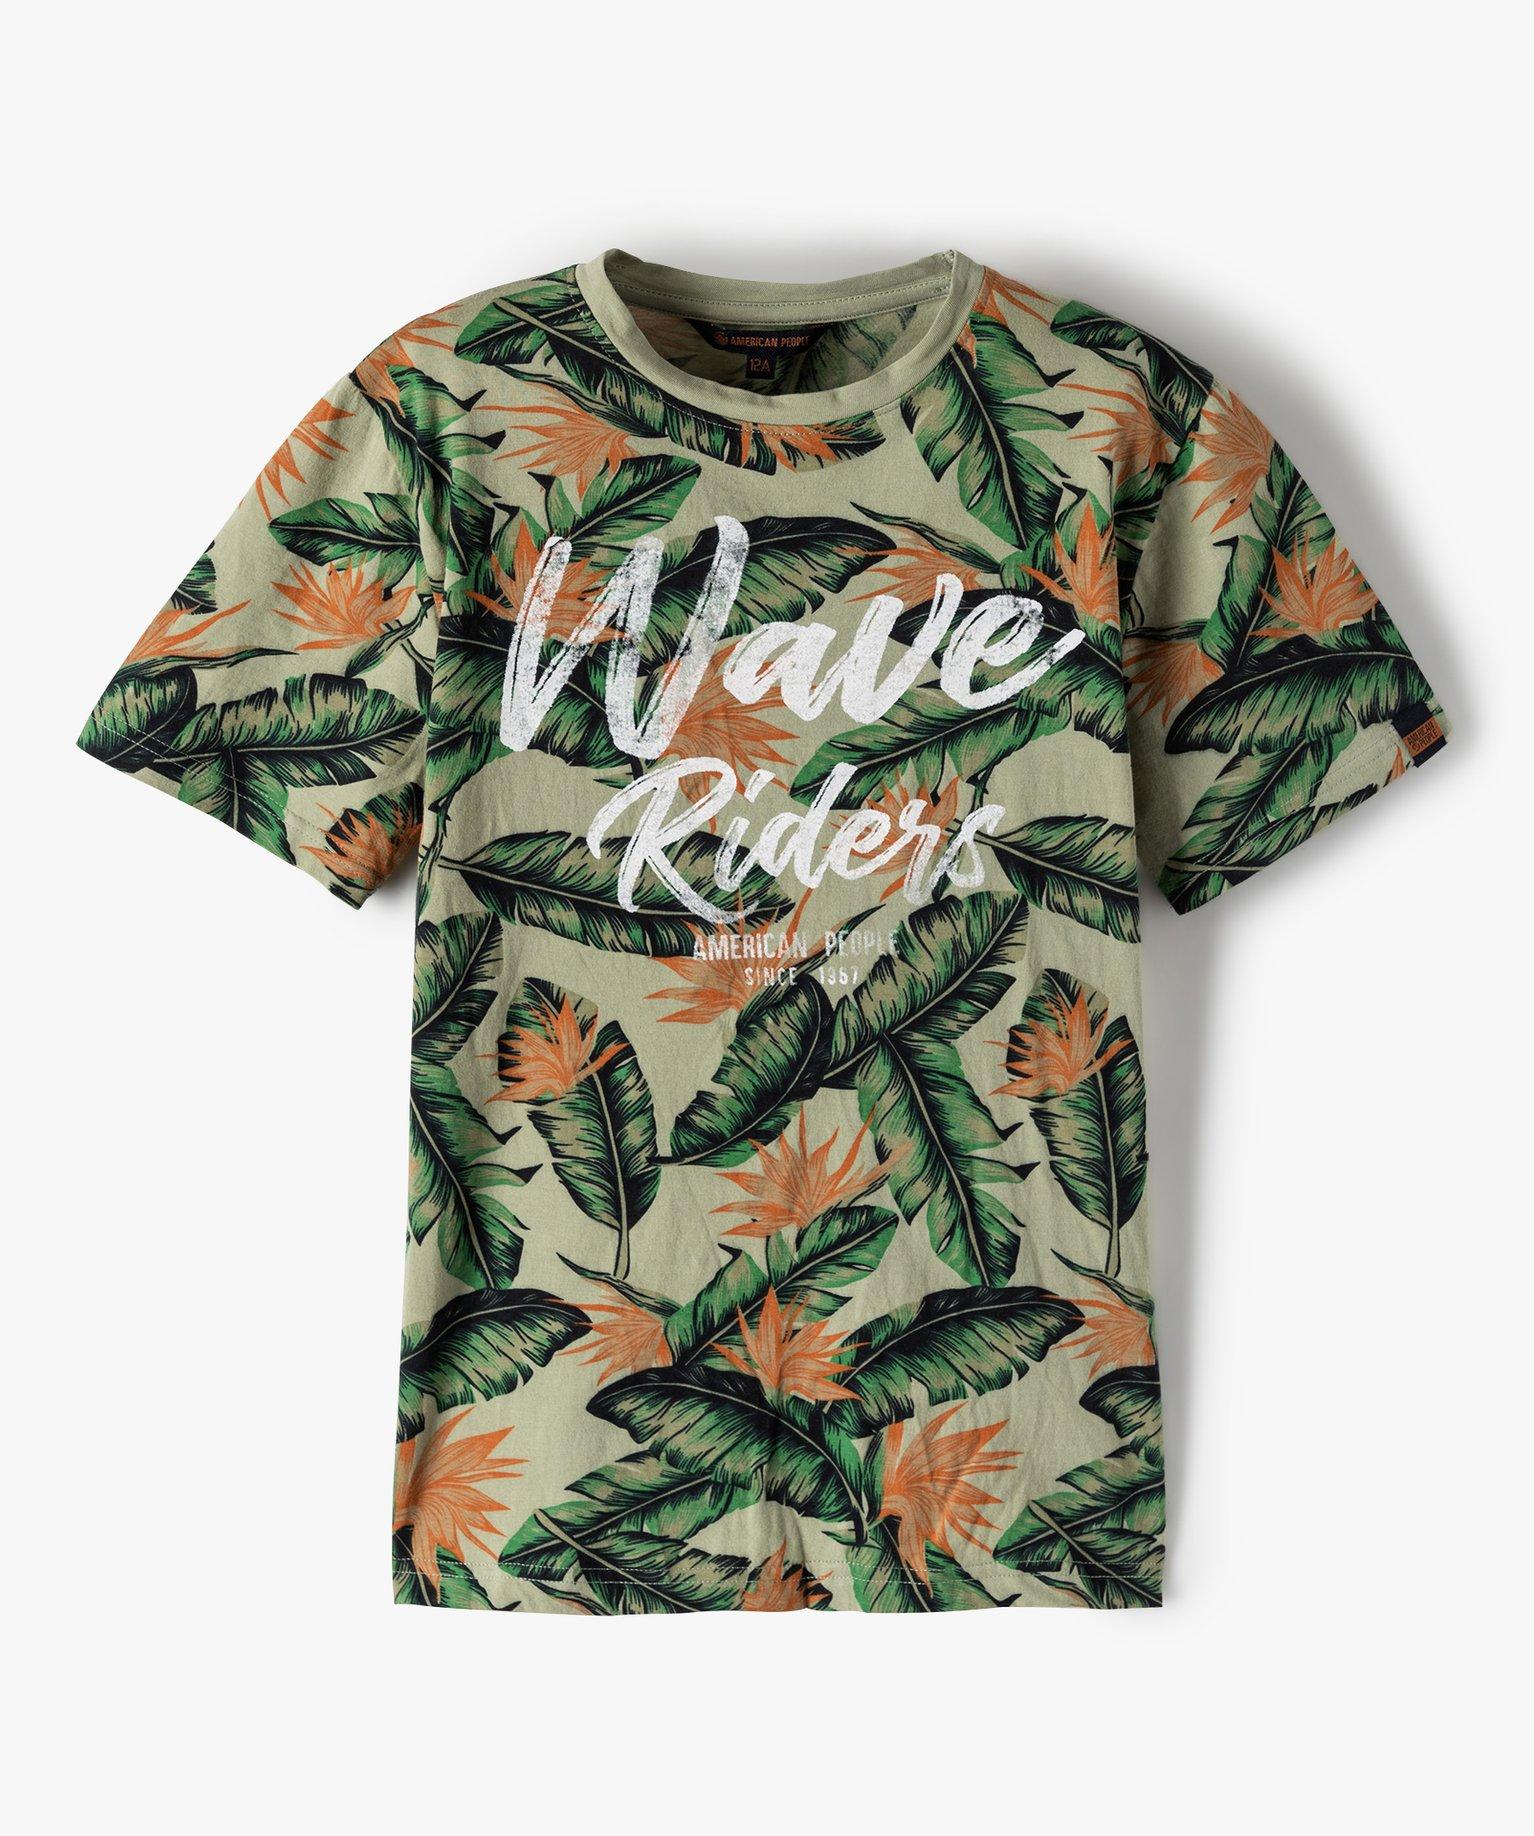 Tee-shirt garçon imprimé jungle - American People